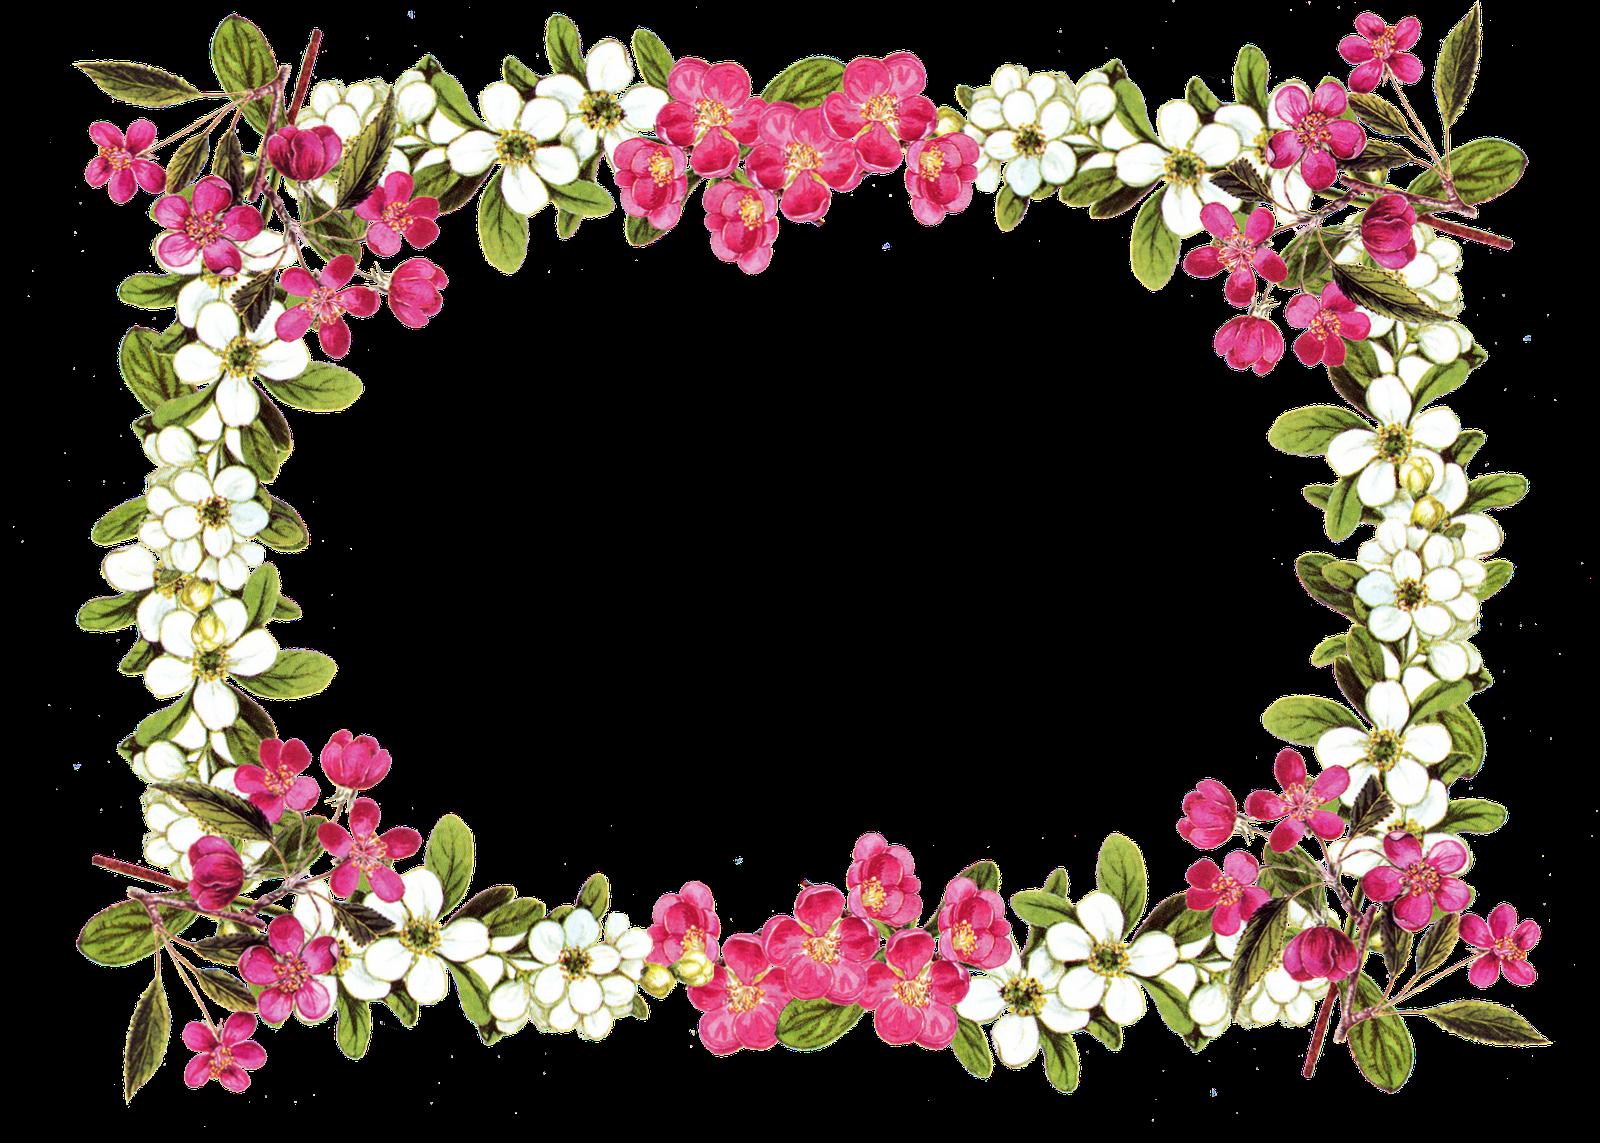 Vintage frame border png. Peonies clipart graduation flower